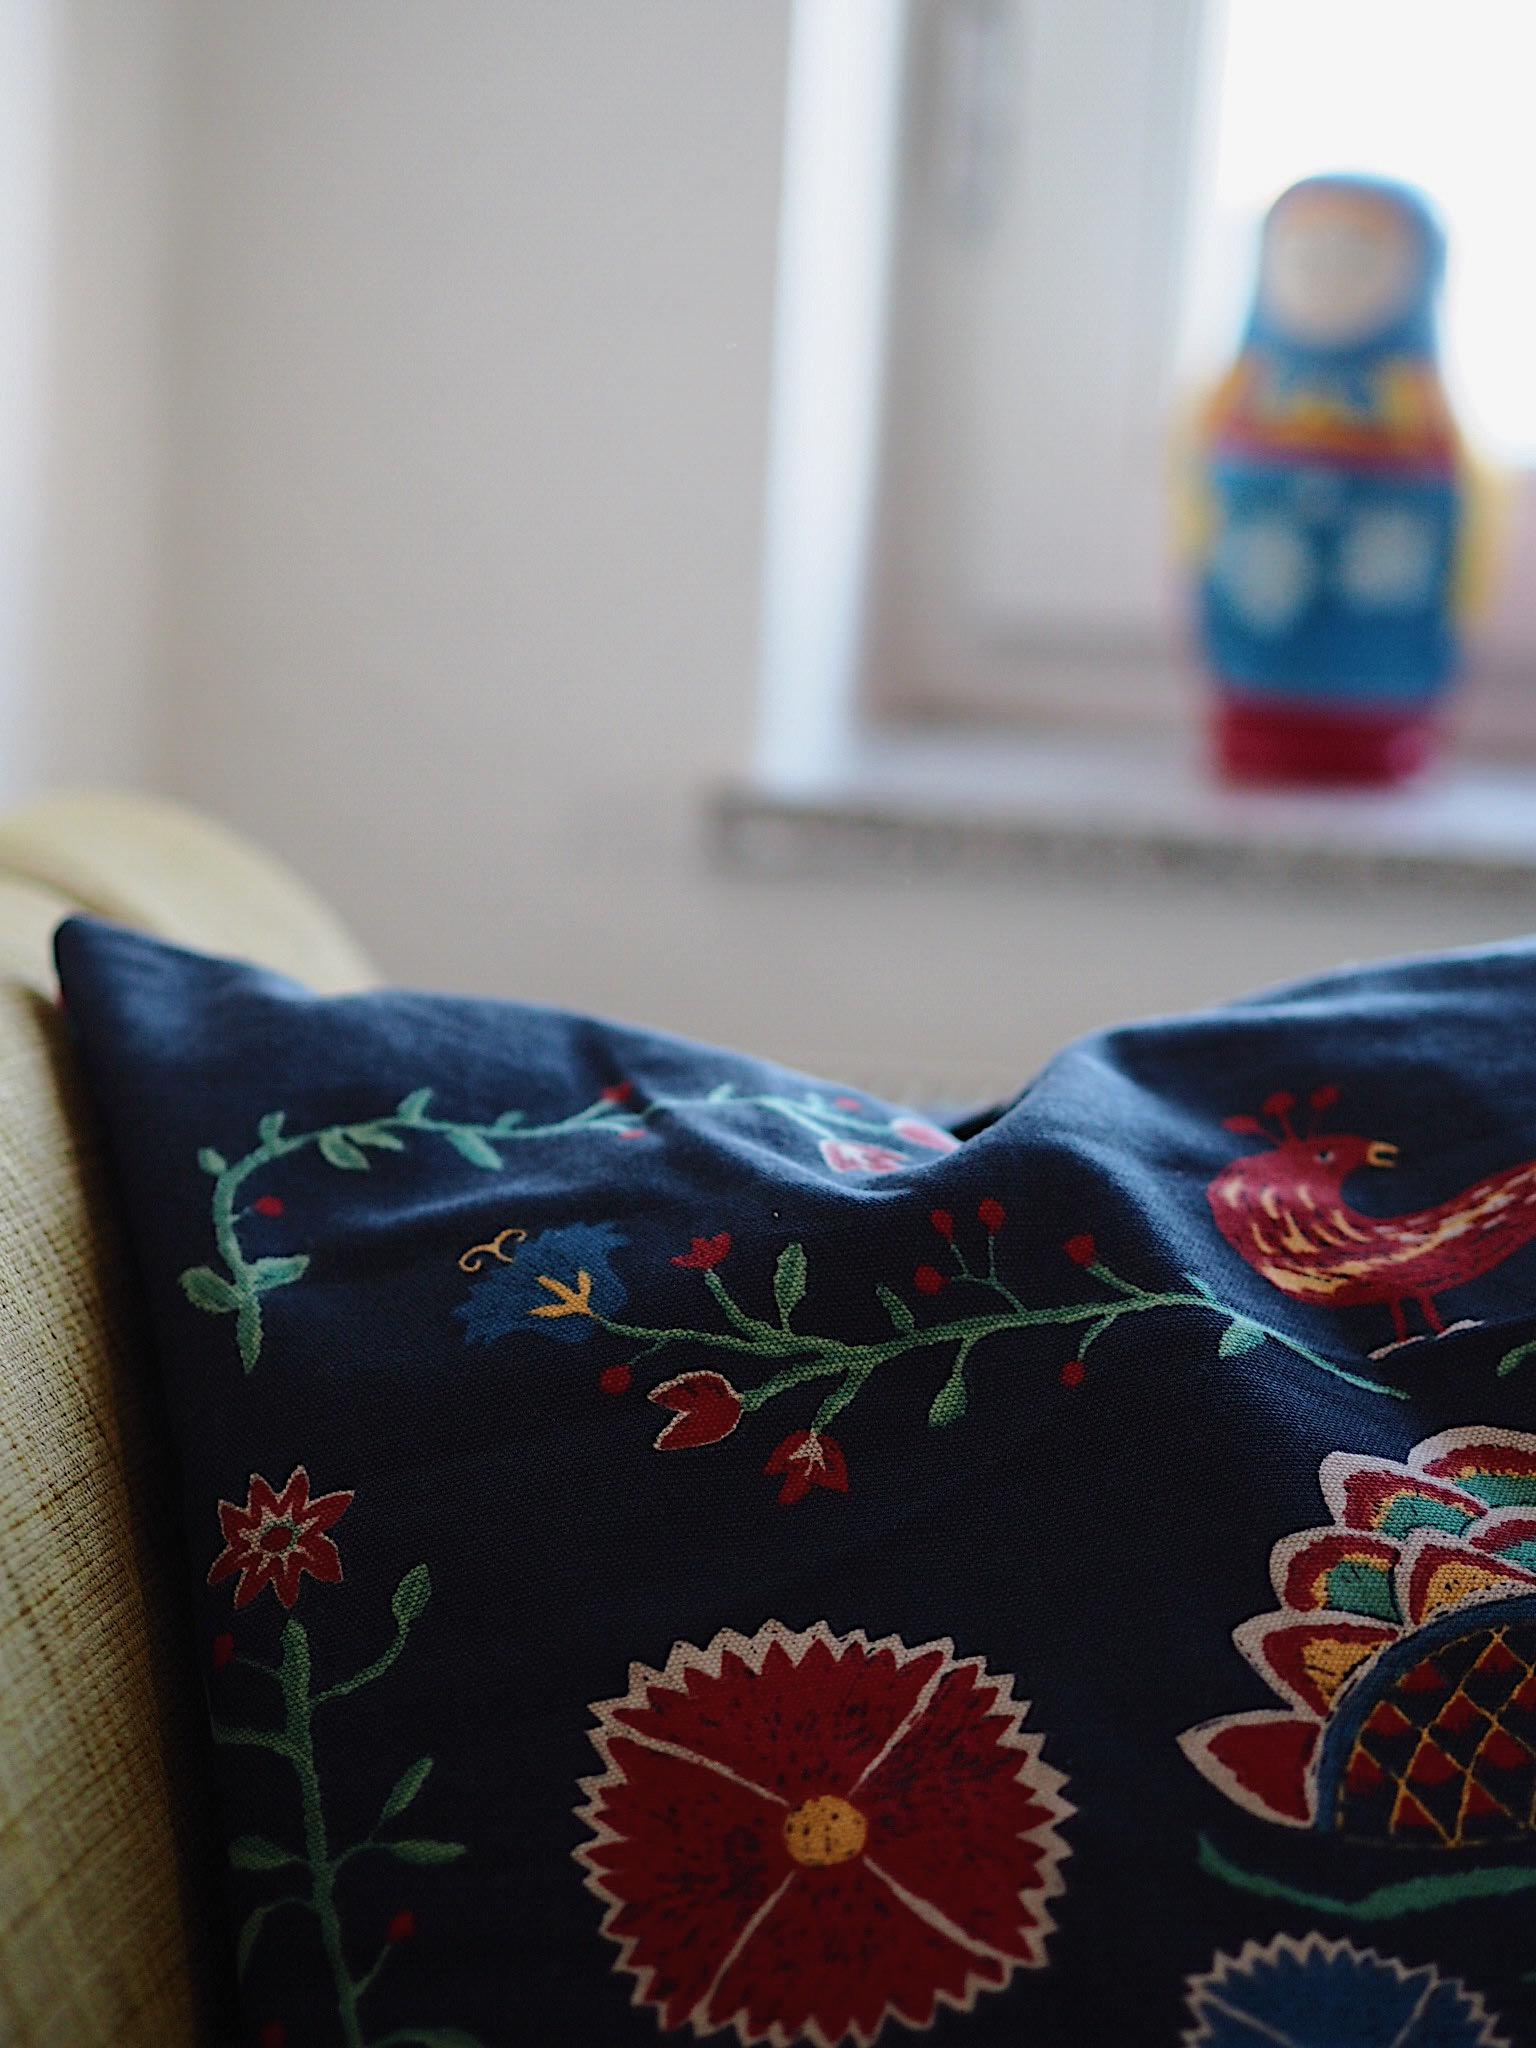 embroidered pillows and matryoshka